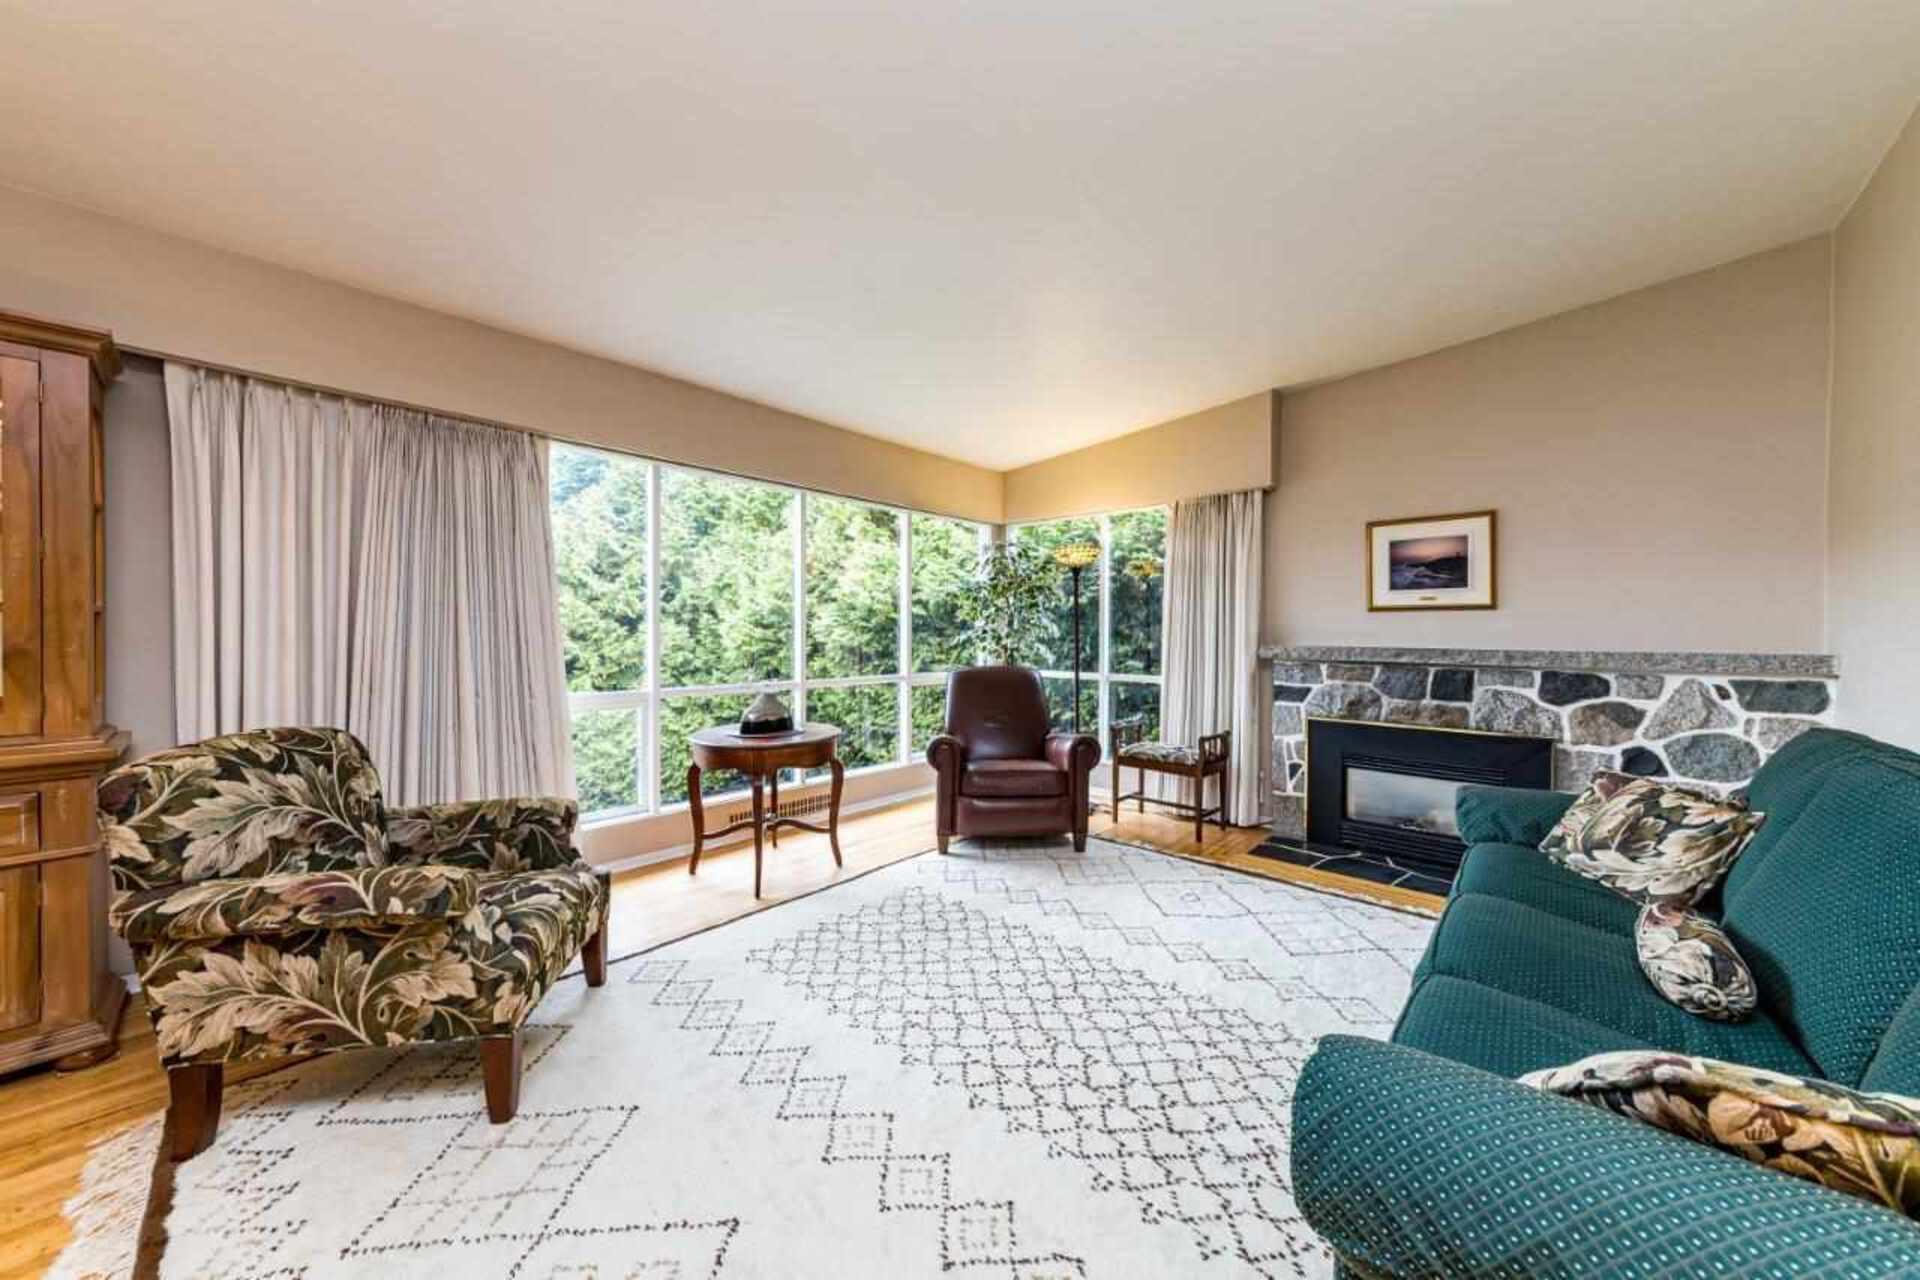 4363-highland-boulevard-forest-hills-nv-north-vancouver-04 at 4363 Highland Boulevard, Forest Hills NV, North Vancouver